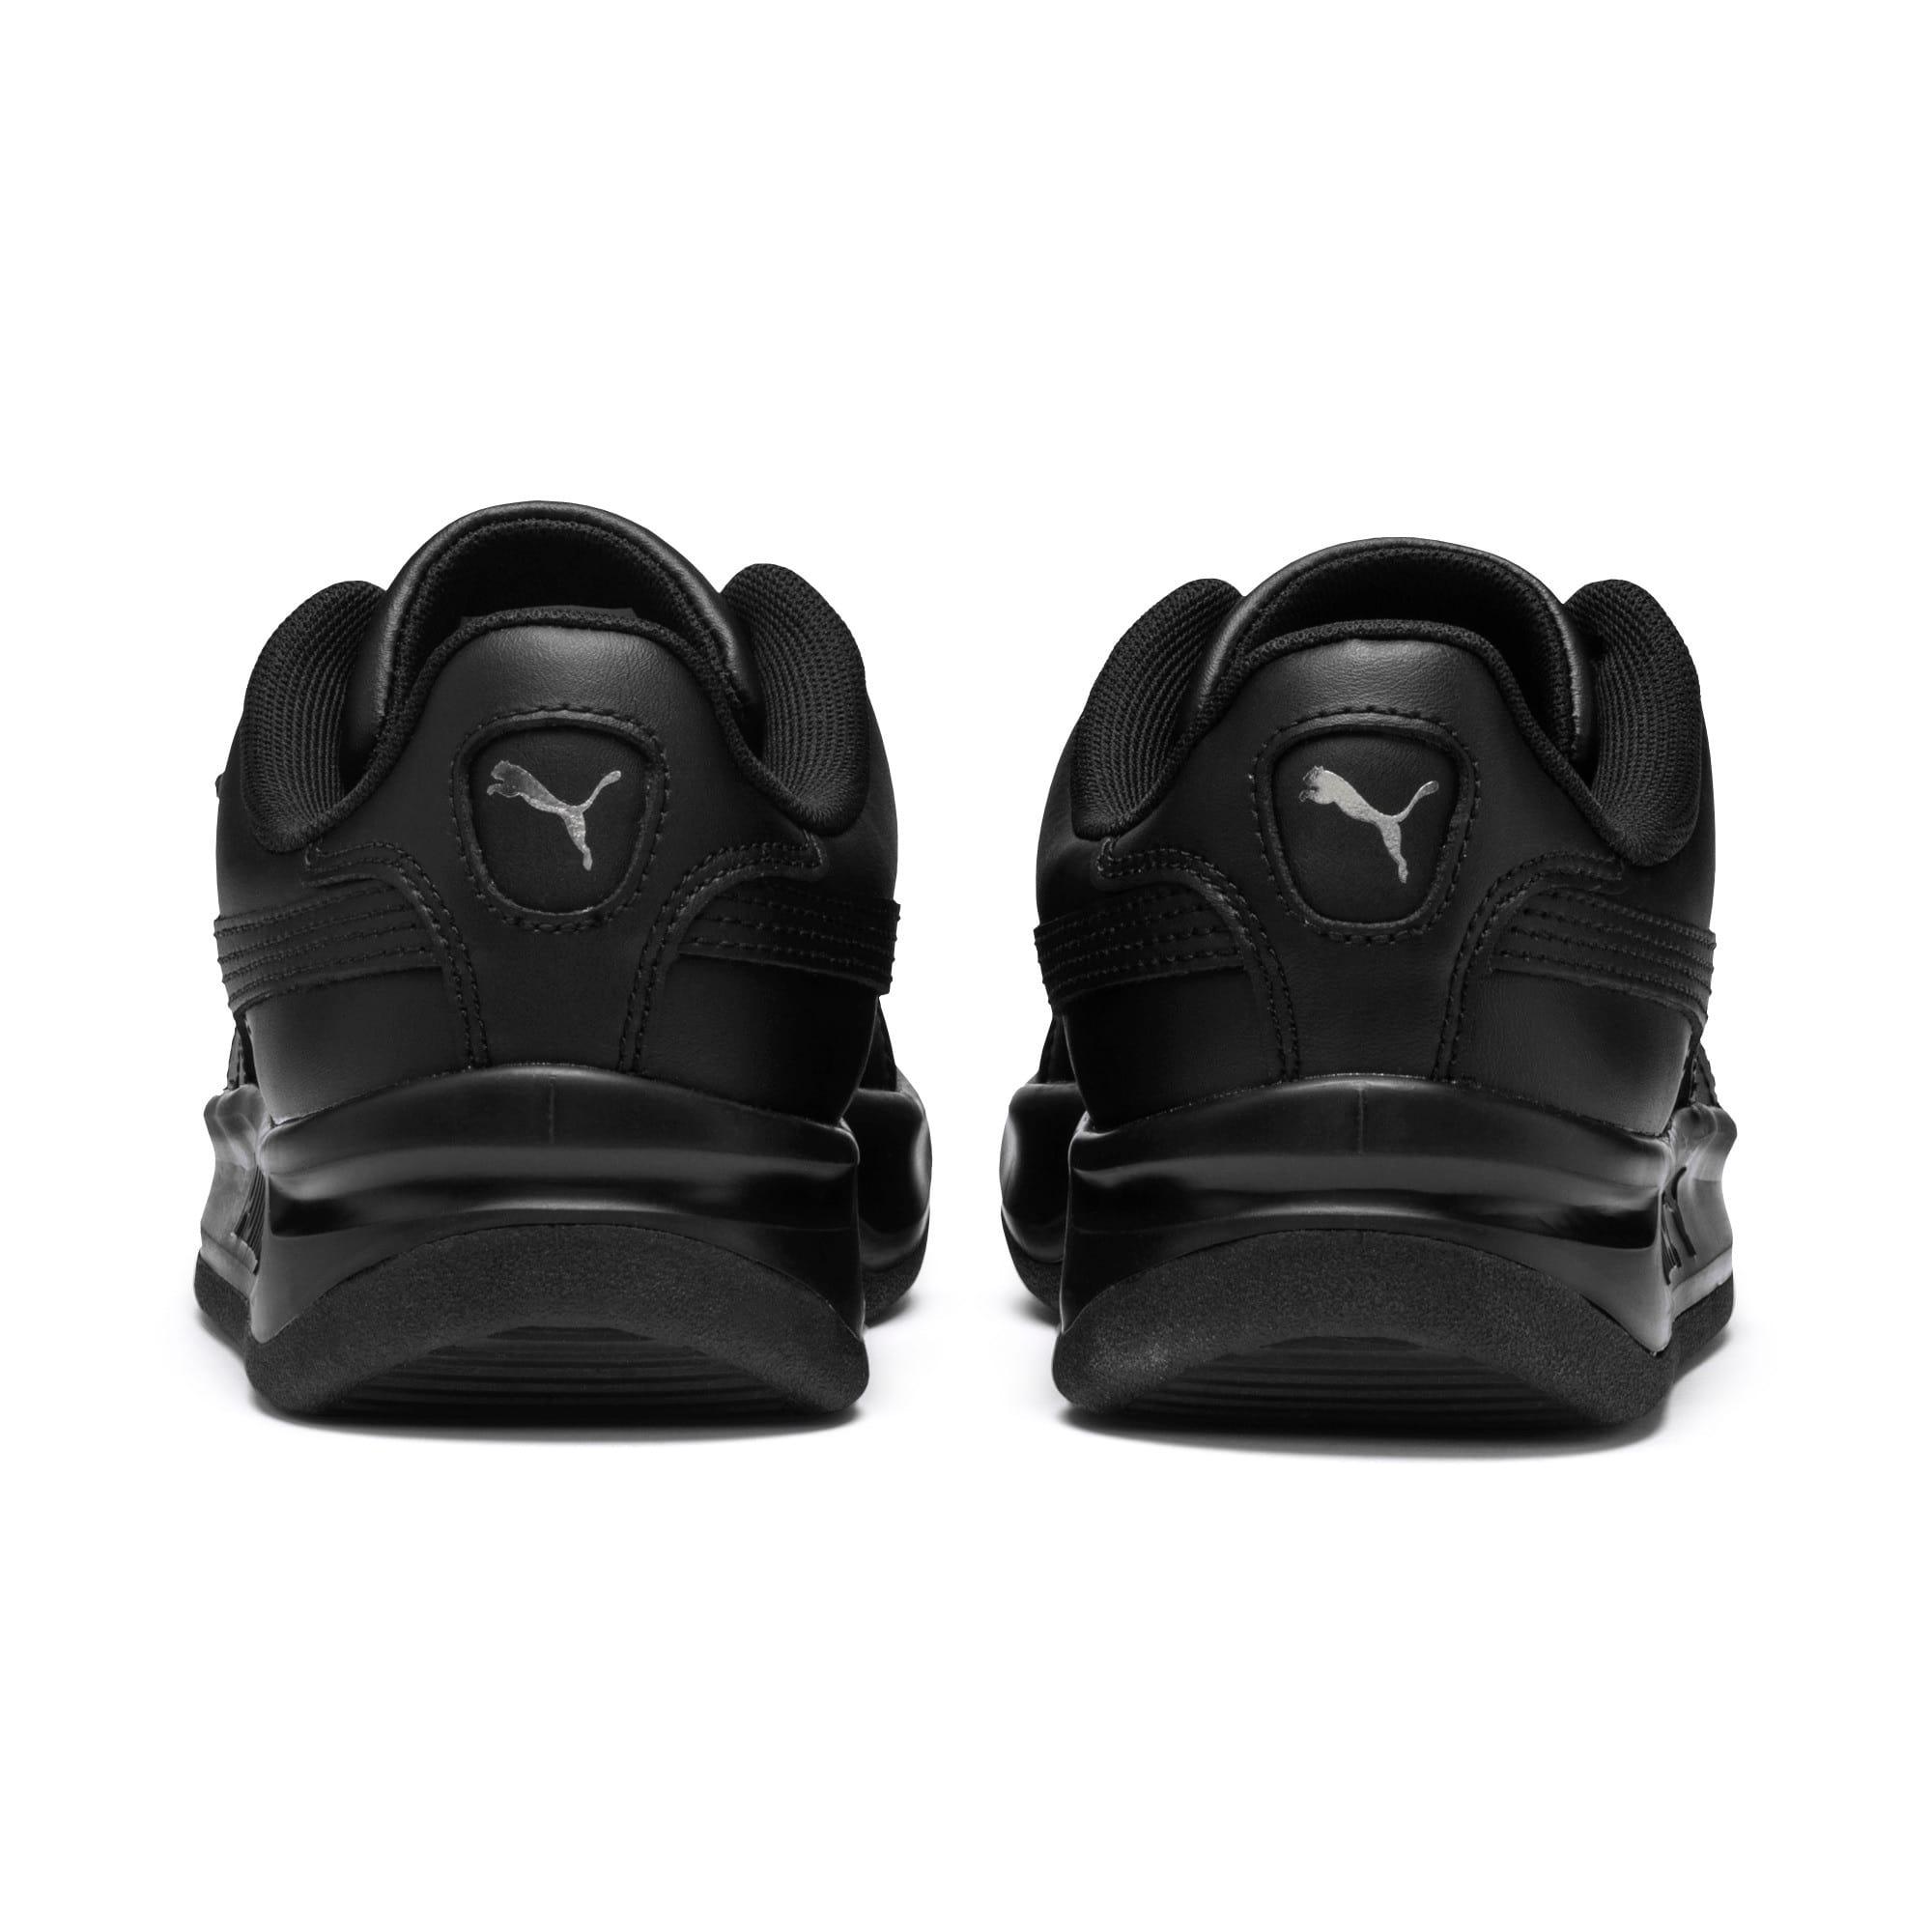 Thumbnail 3 of California Exotic Women's Sneakers, Puma Black-Metallic Ash, medium